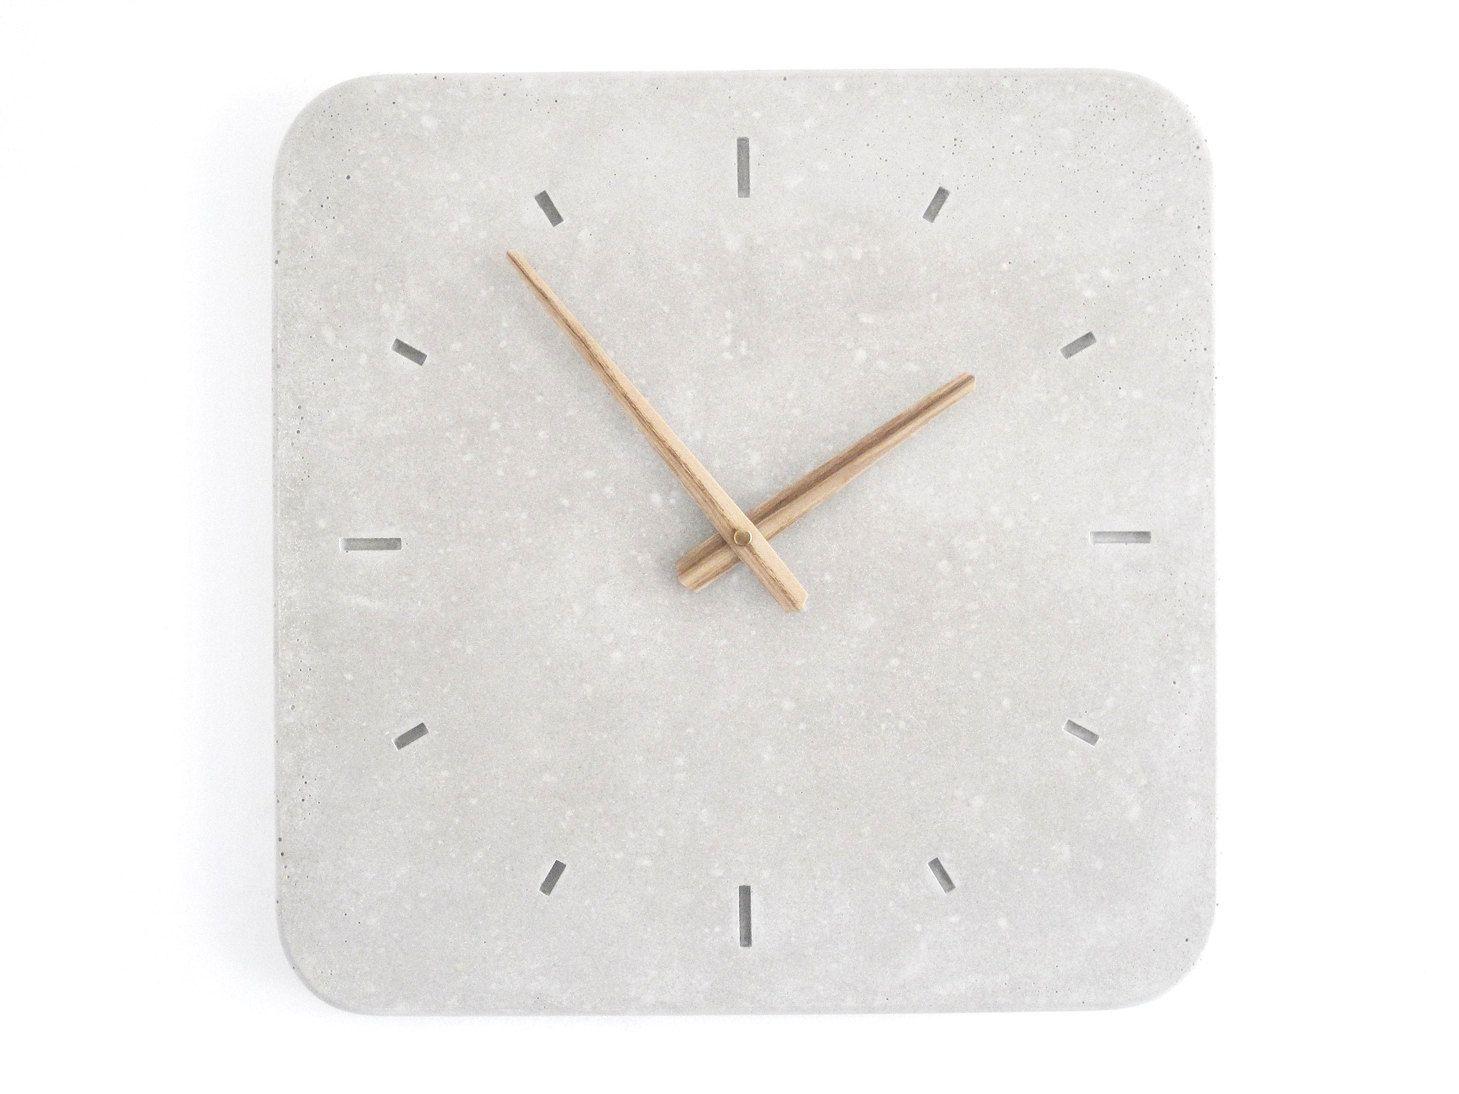 Concrete Wall Clock Wertwerke Wanduhren Wanduhr Weiß Uhr